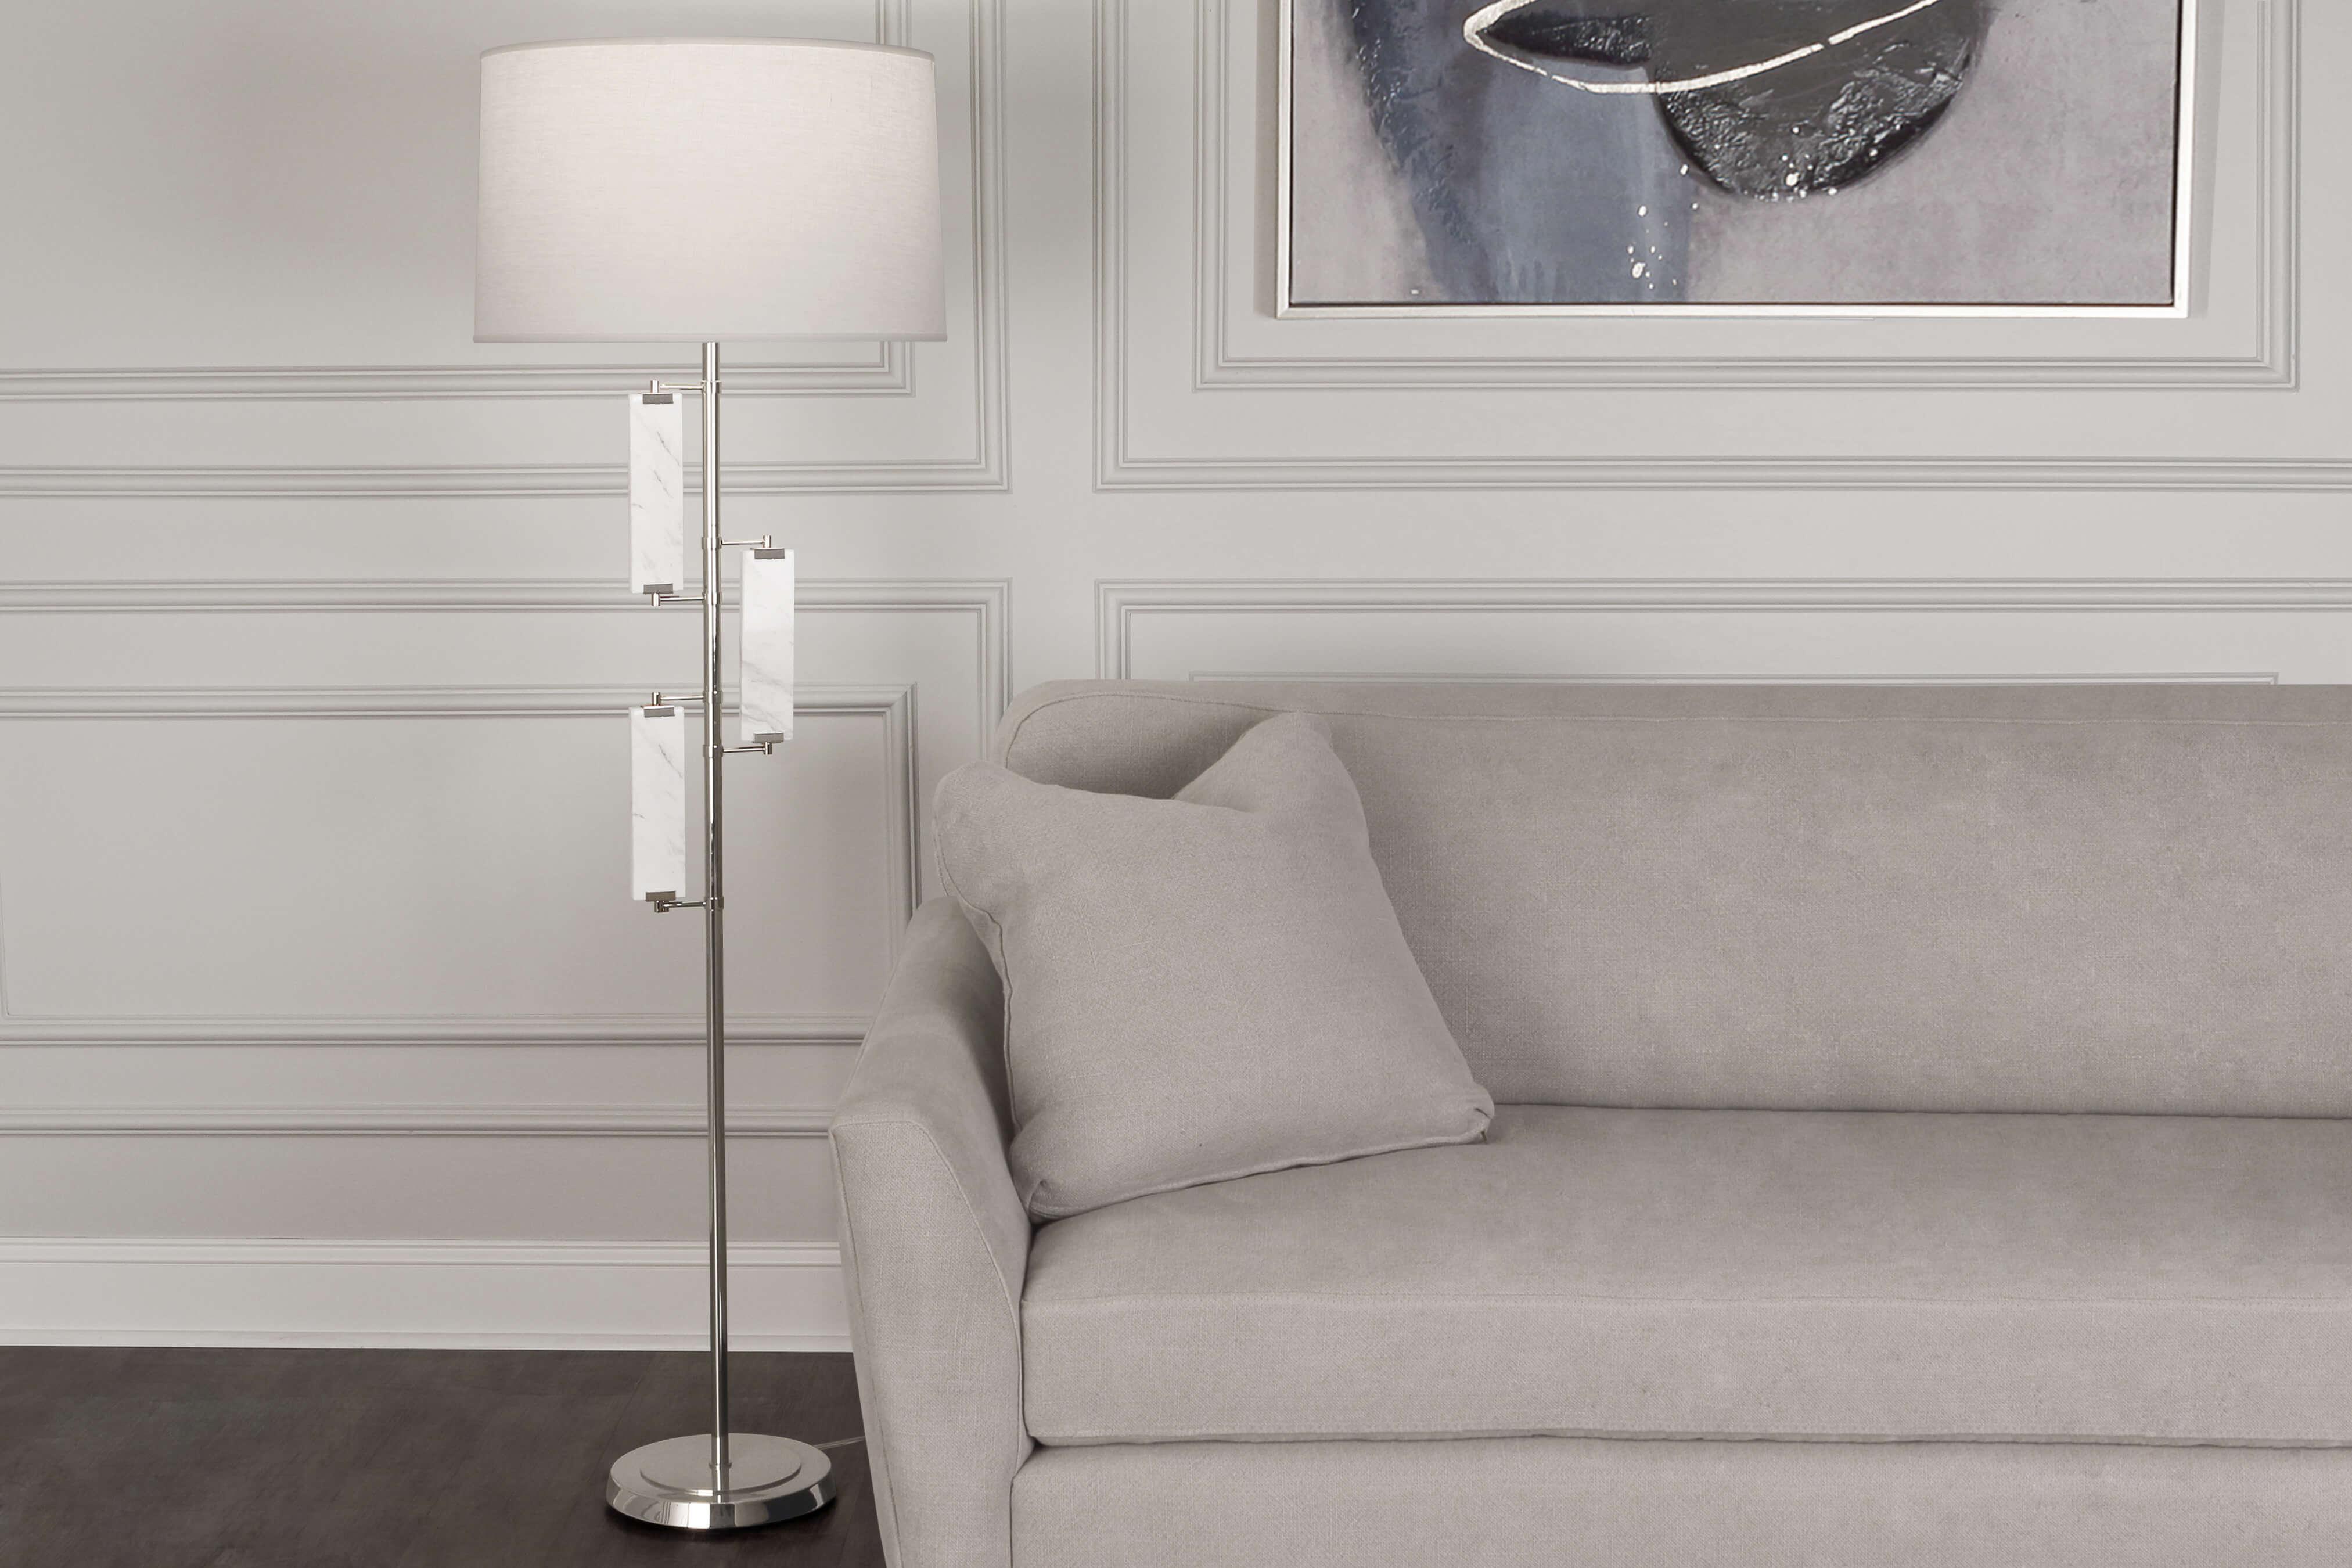 ALSTON FLOOR LAMP by Robert Abbey